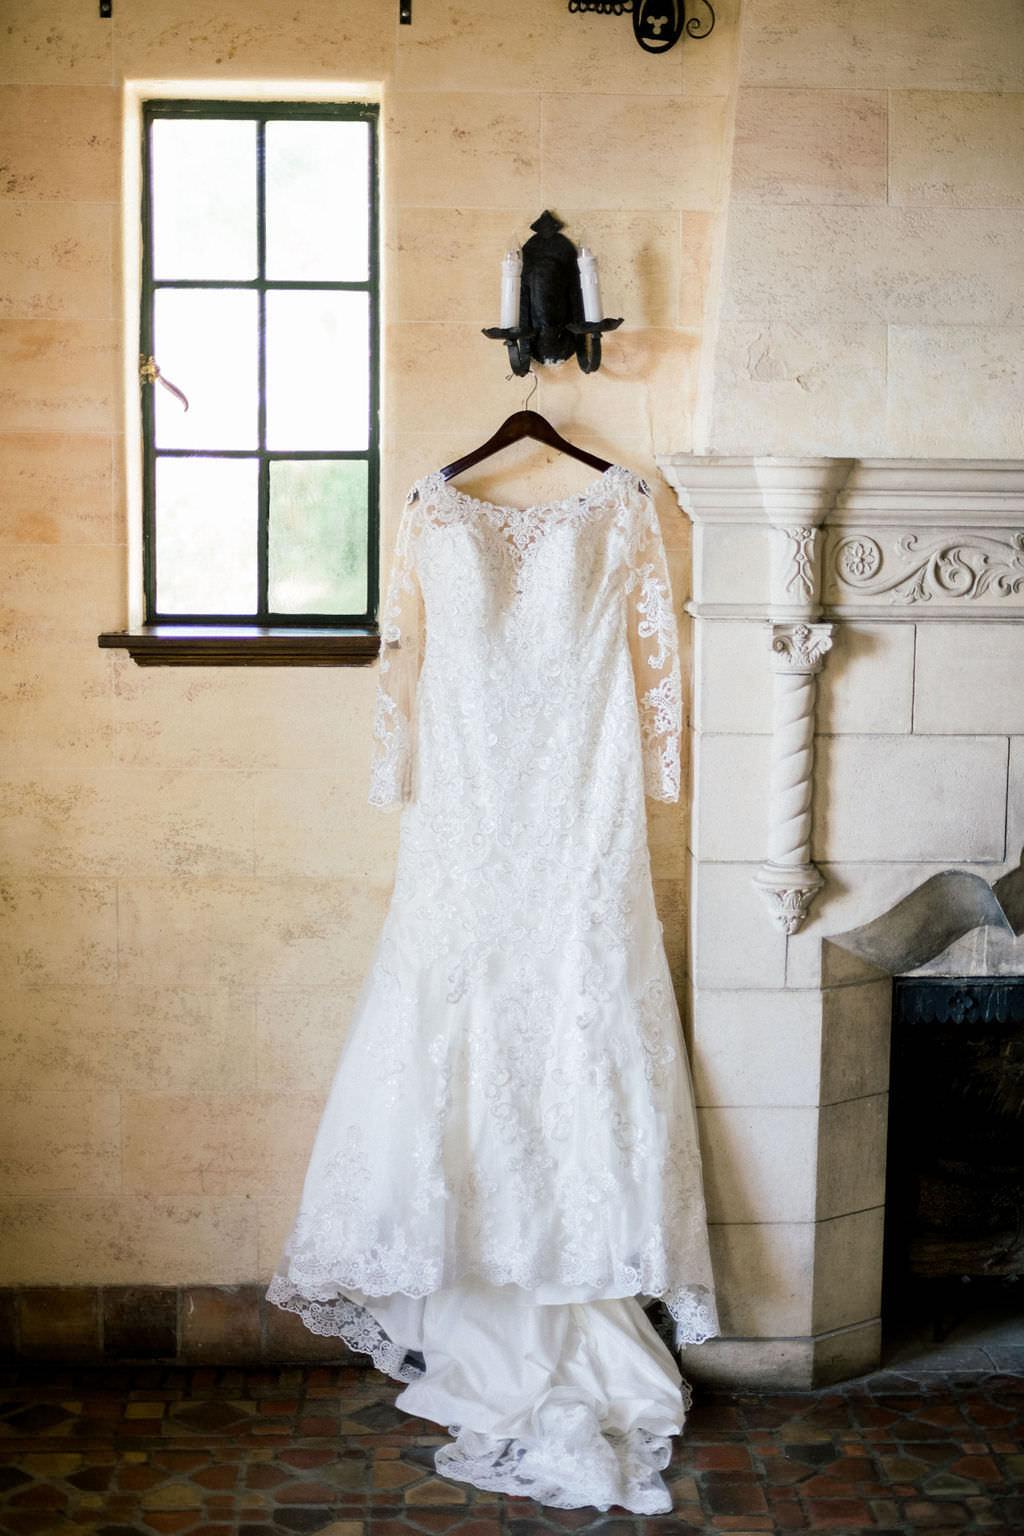 Classic White Mermaid Style Lace Wedding Dress with Illusion Sleeves, Bateau Neckline